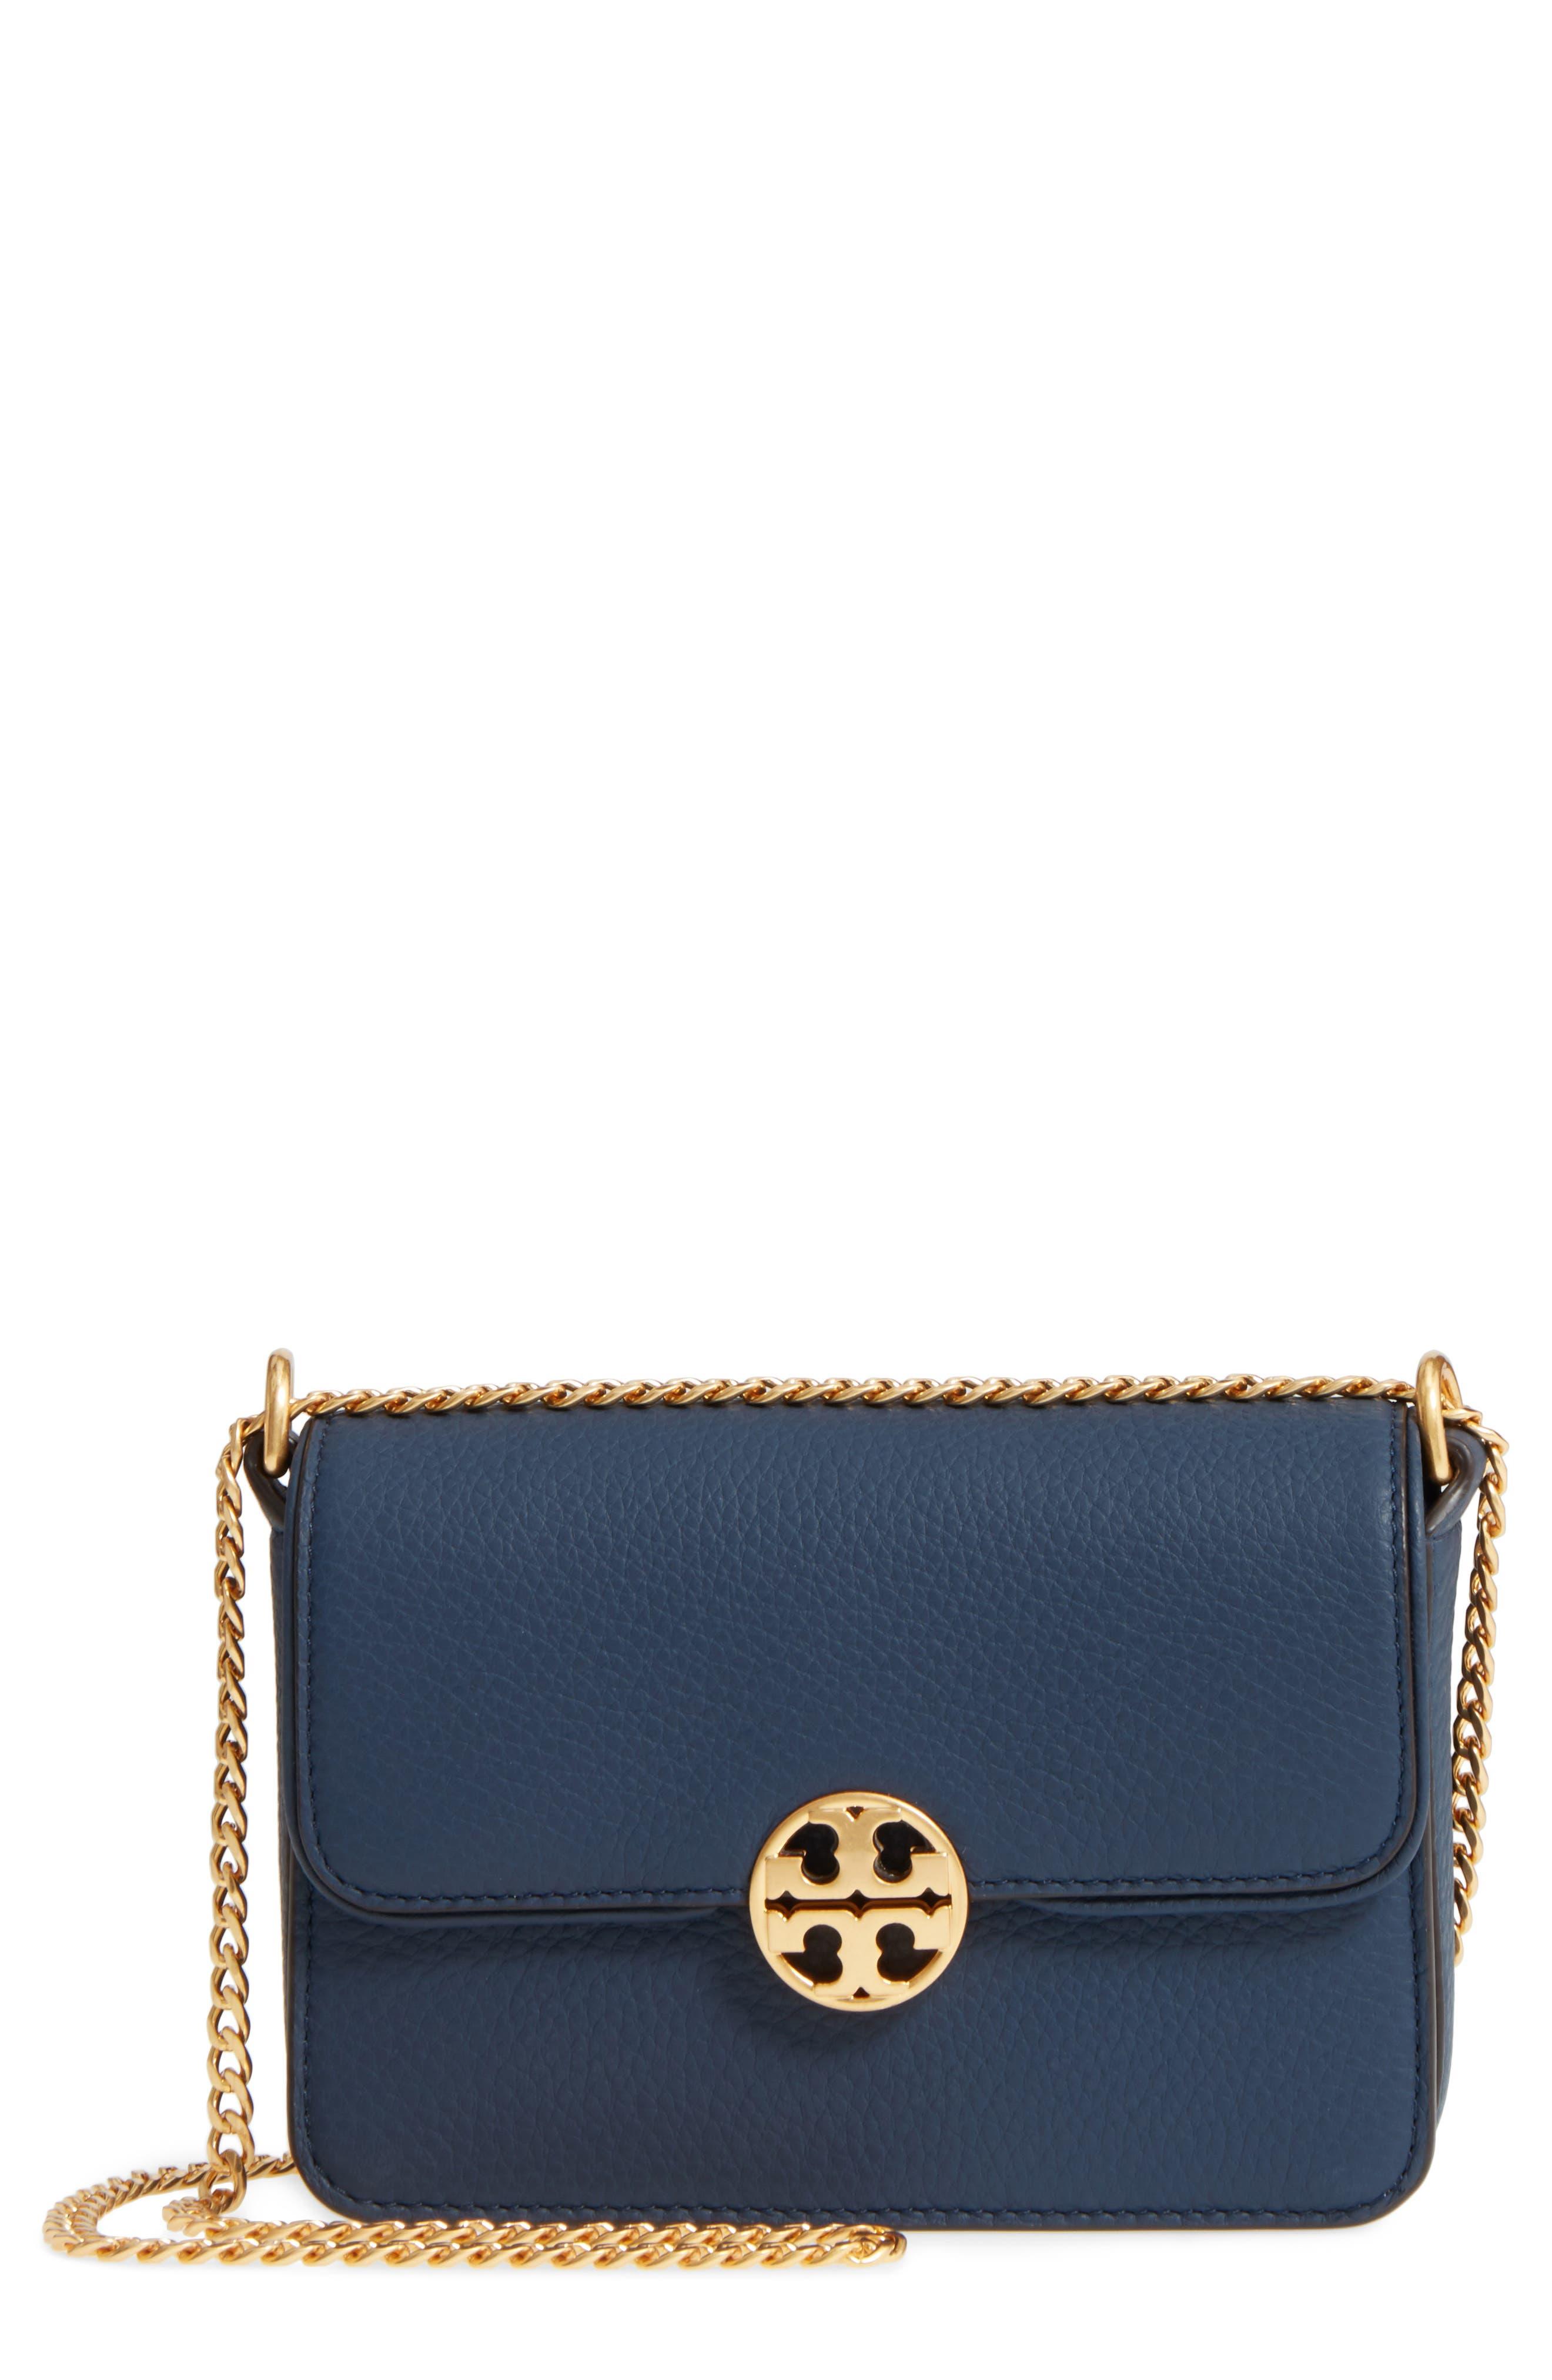 Tory Burch Mini Chelsea Leather Convertible Crossbody Bag